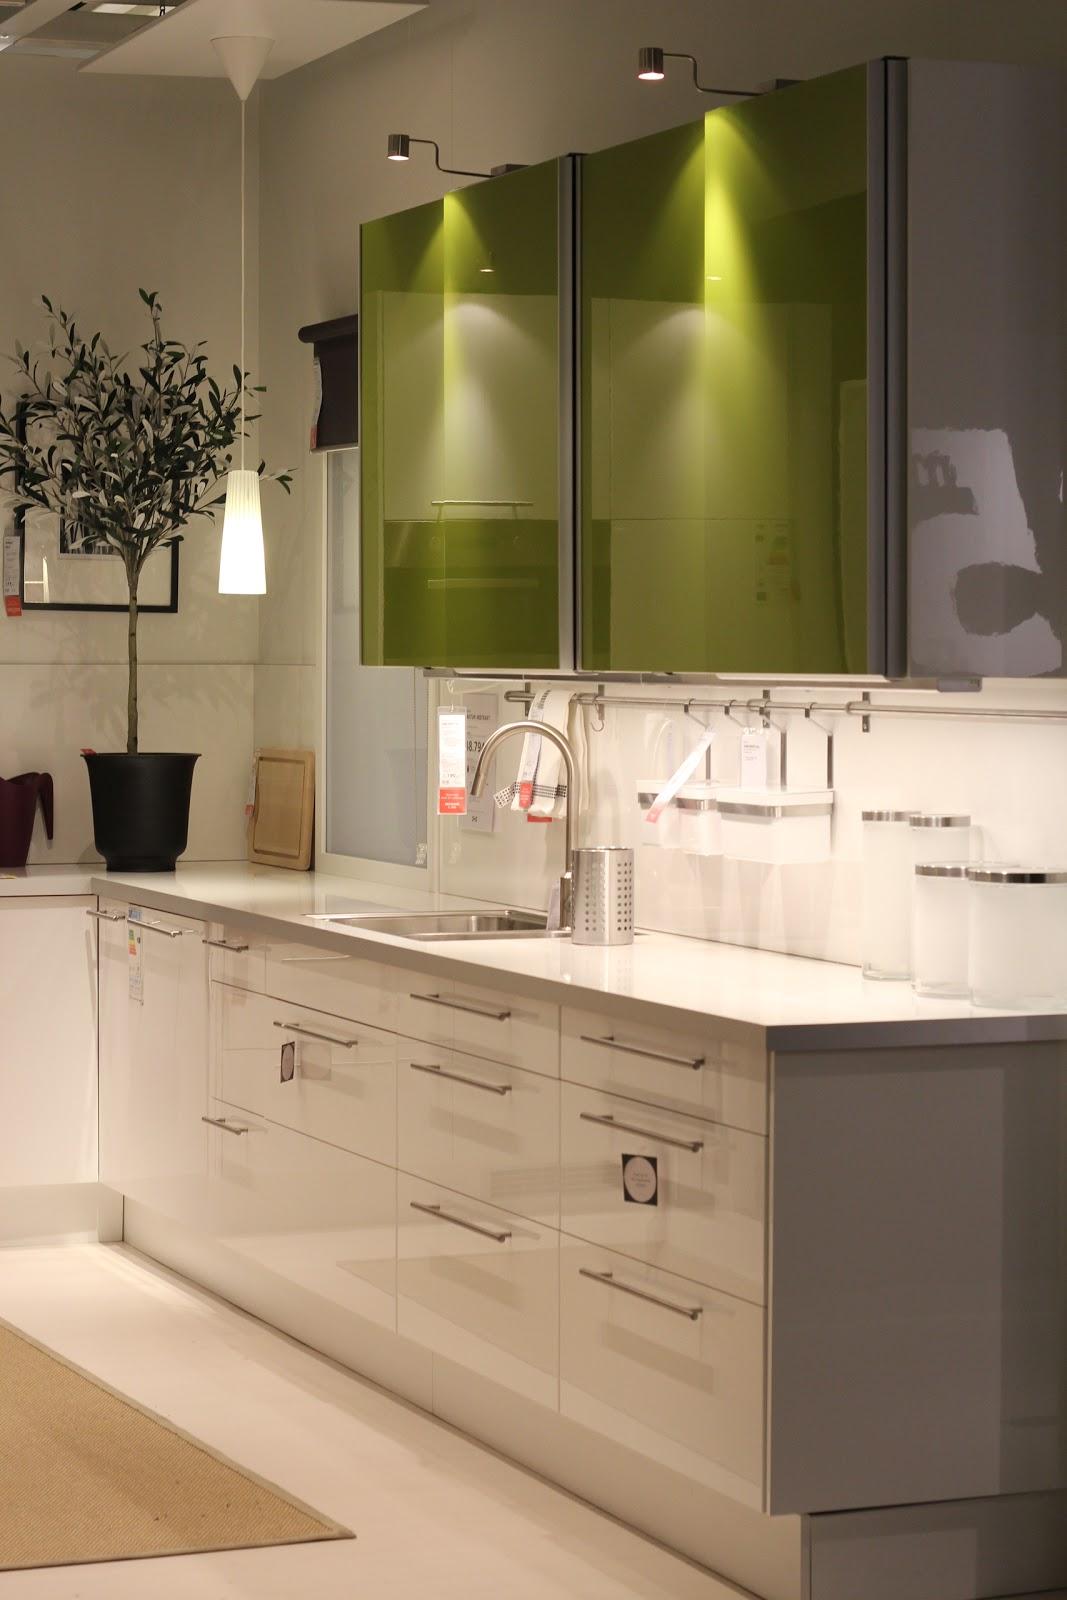 interi rkonsulent ikea kj kken. Black Bedroom Furniture Sets. Home Design Ideas